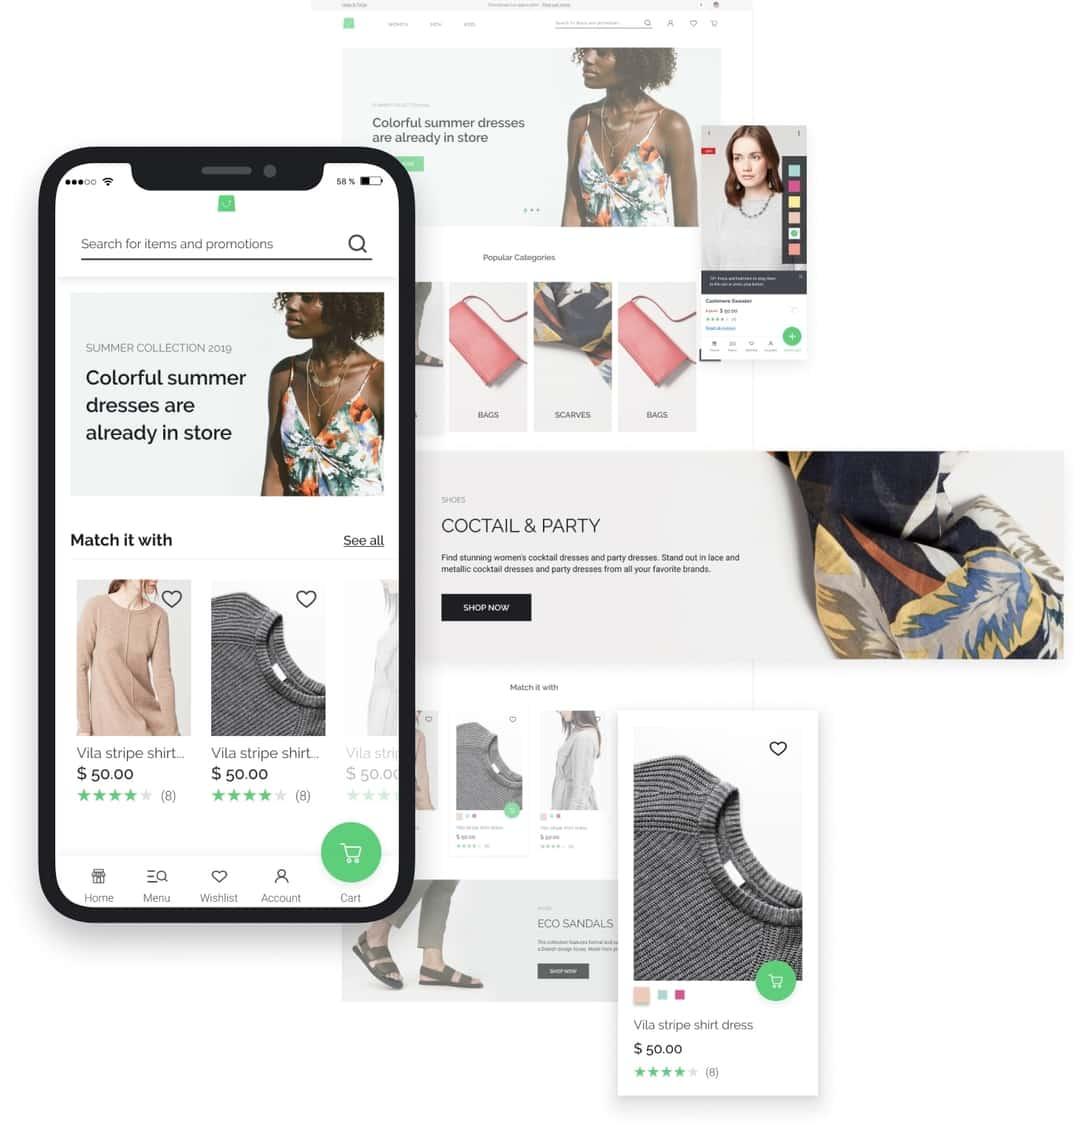 Integra Vue Storefront con Magento, Shopware e Prestashop